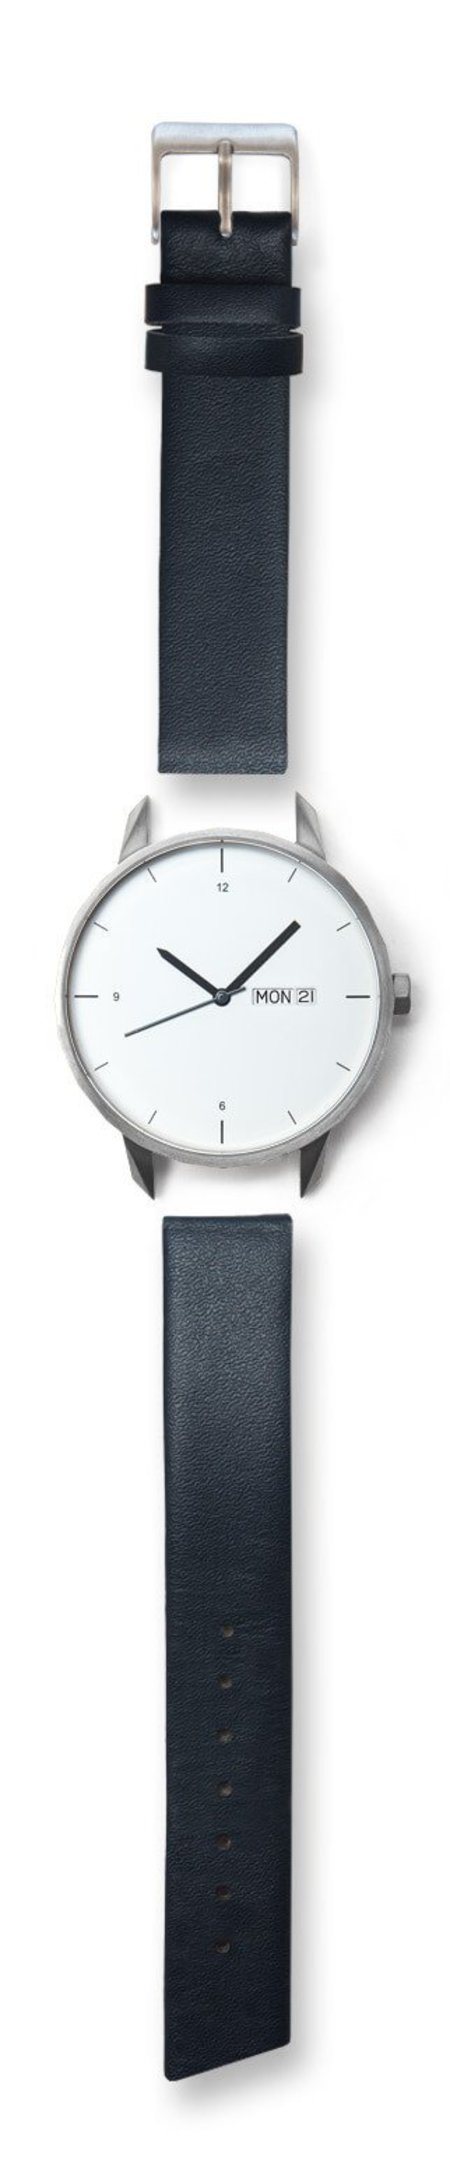 Unisex Tinker Watches 42mm Silver Watch Navy Strap